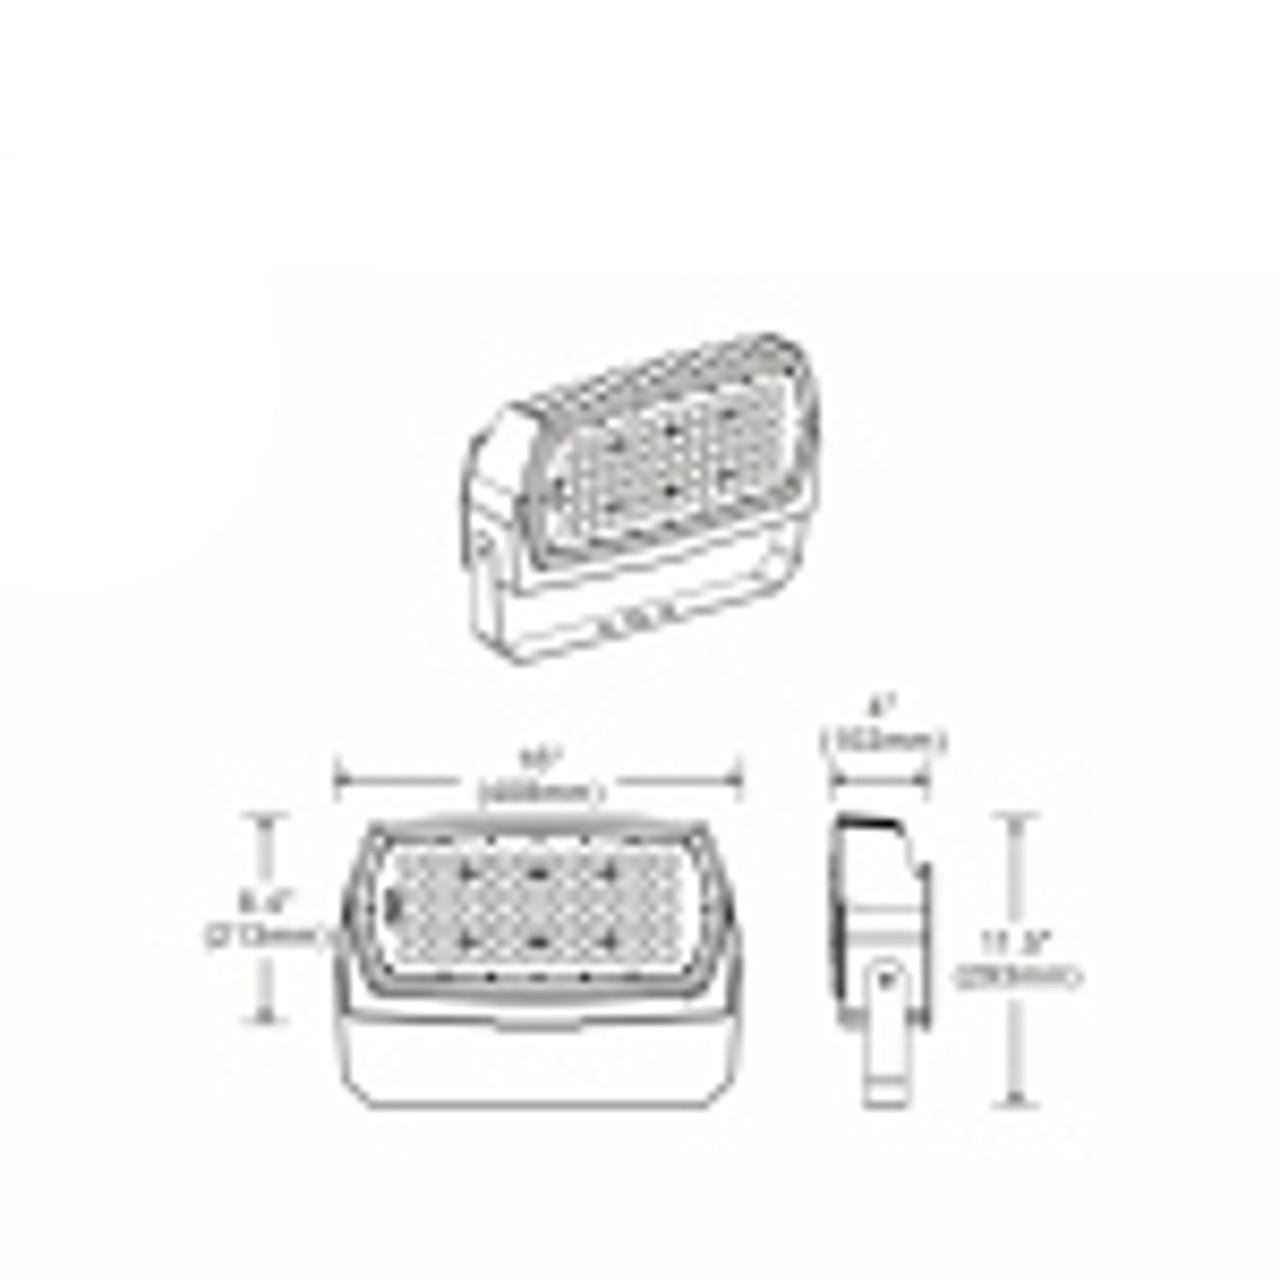 Slim Line LED Flood Light, 187 watt, 23465 lumen, 120-277 volt, UL DLC Listed, with trunnion mount